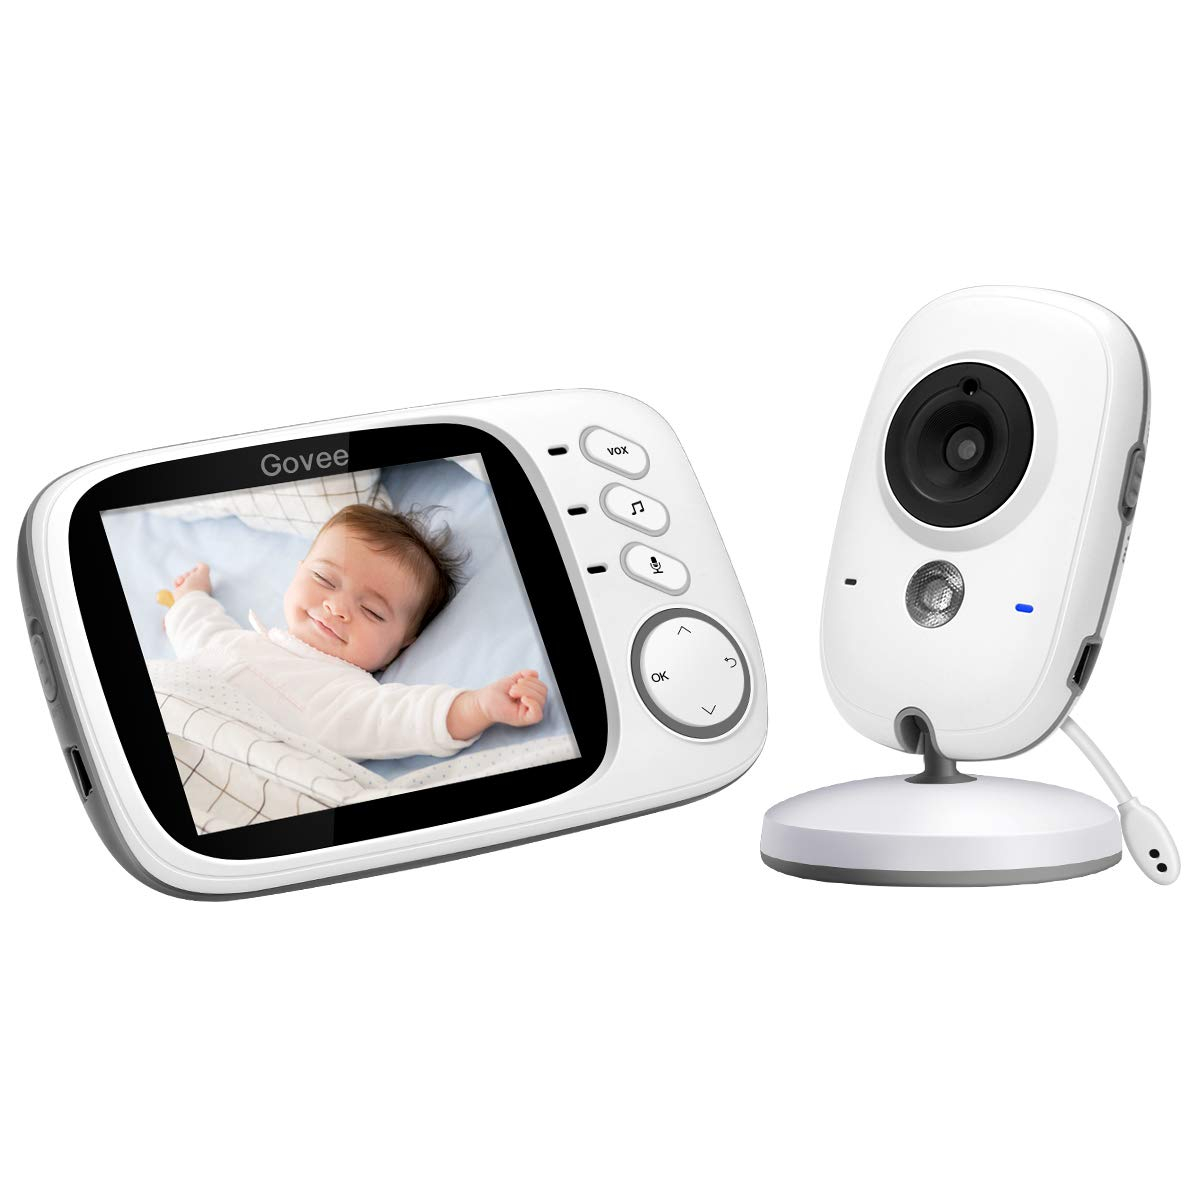 Babyphone vidéo sans fil - Govee -